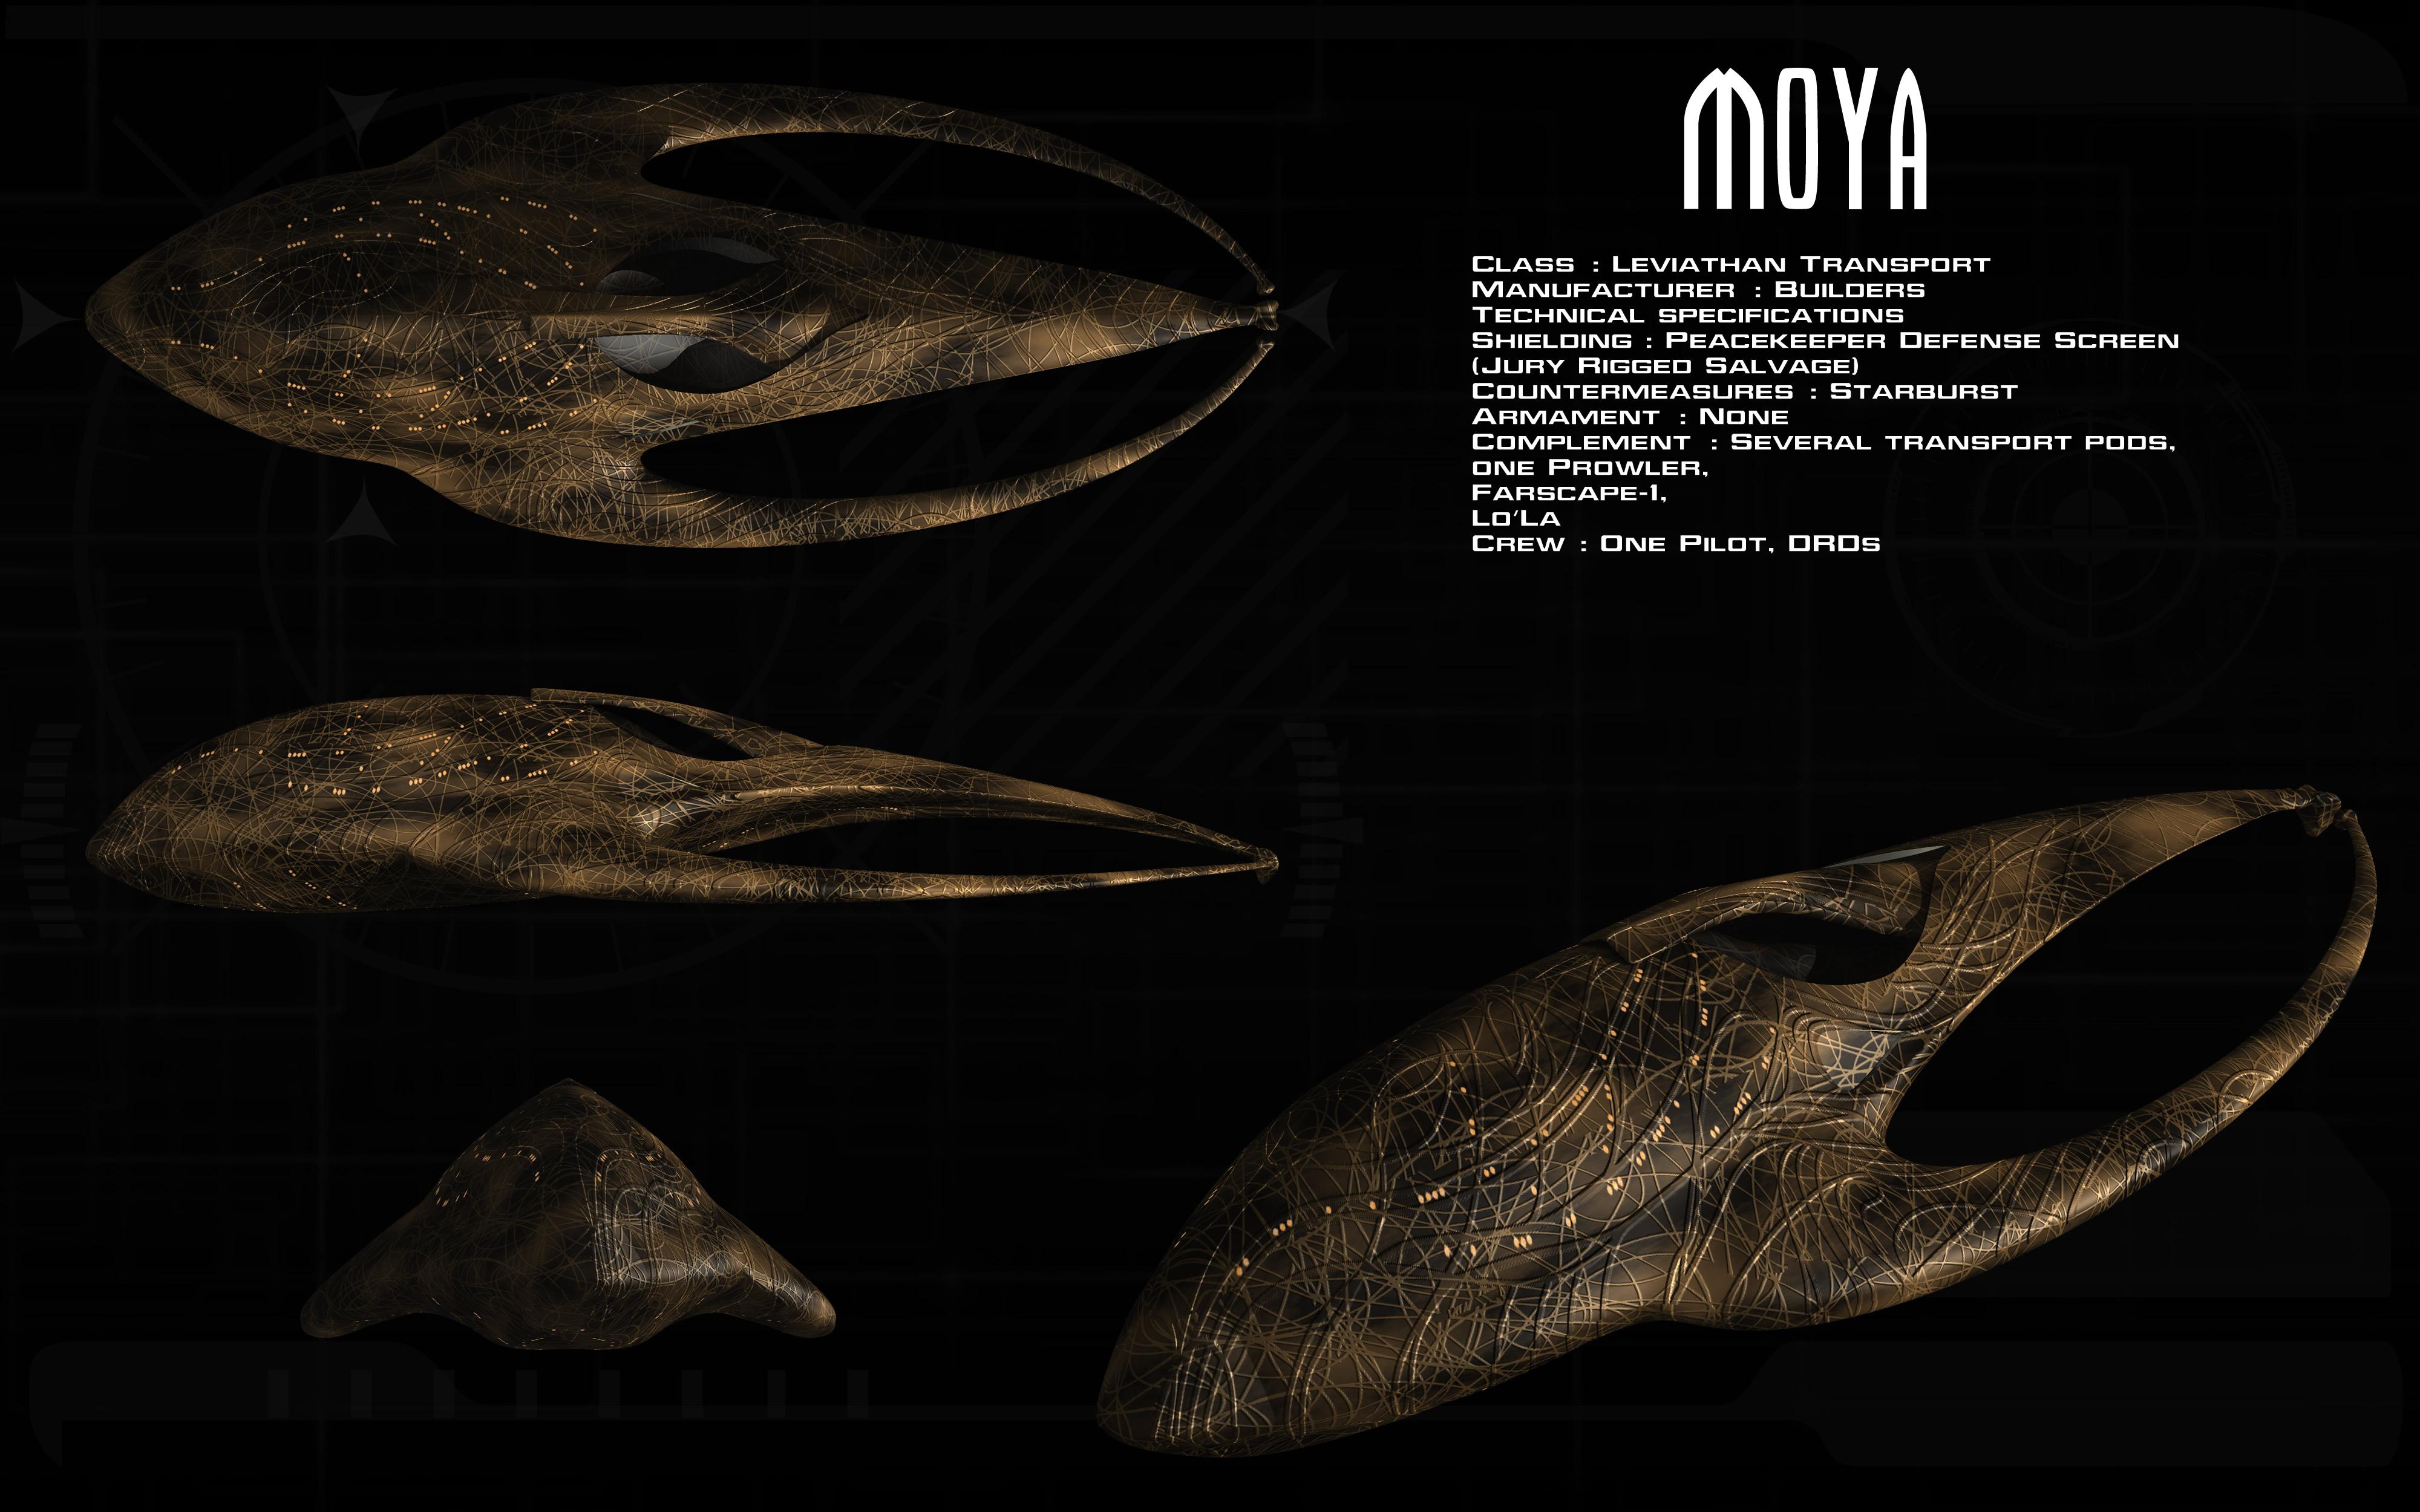 Moya - Farscape